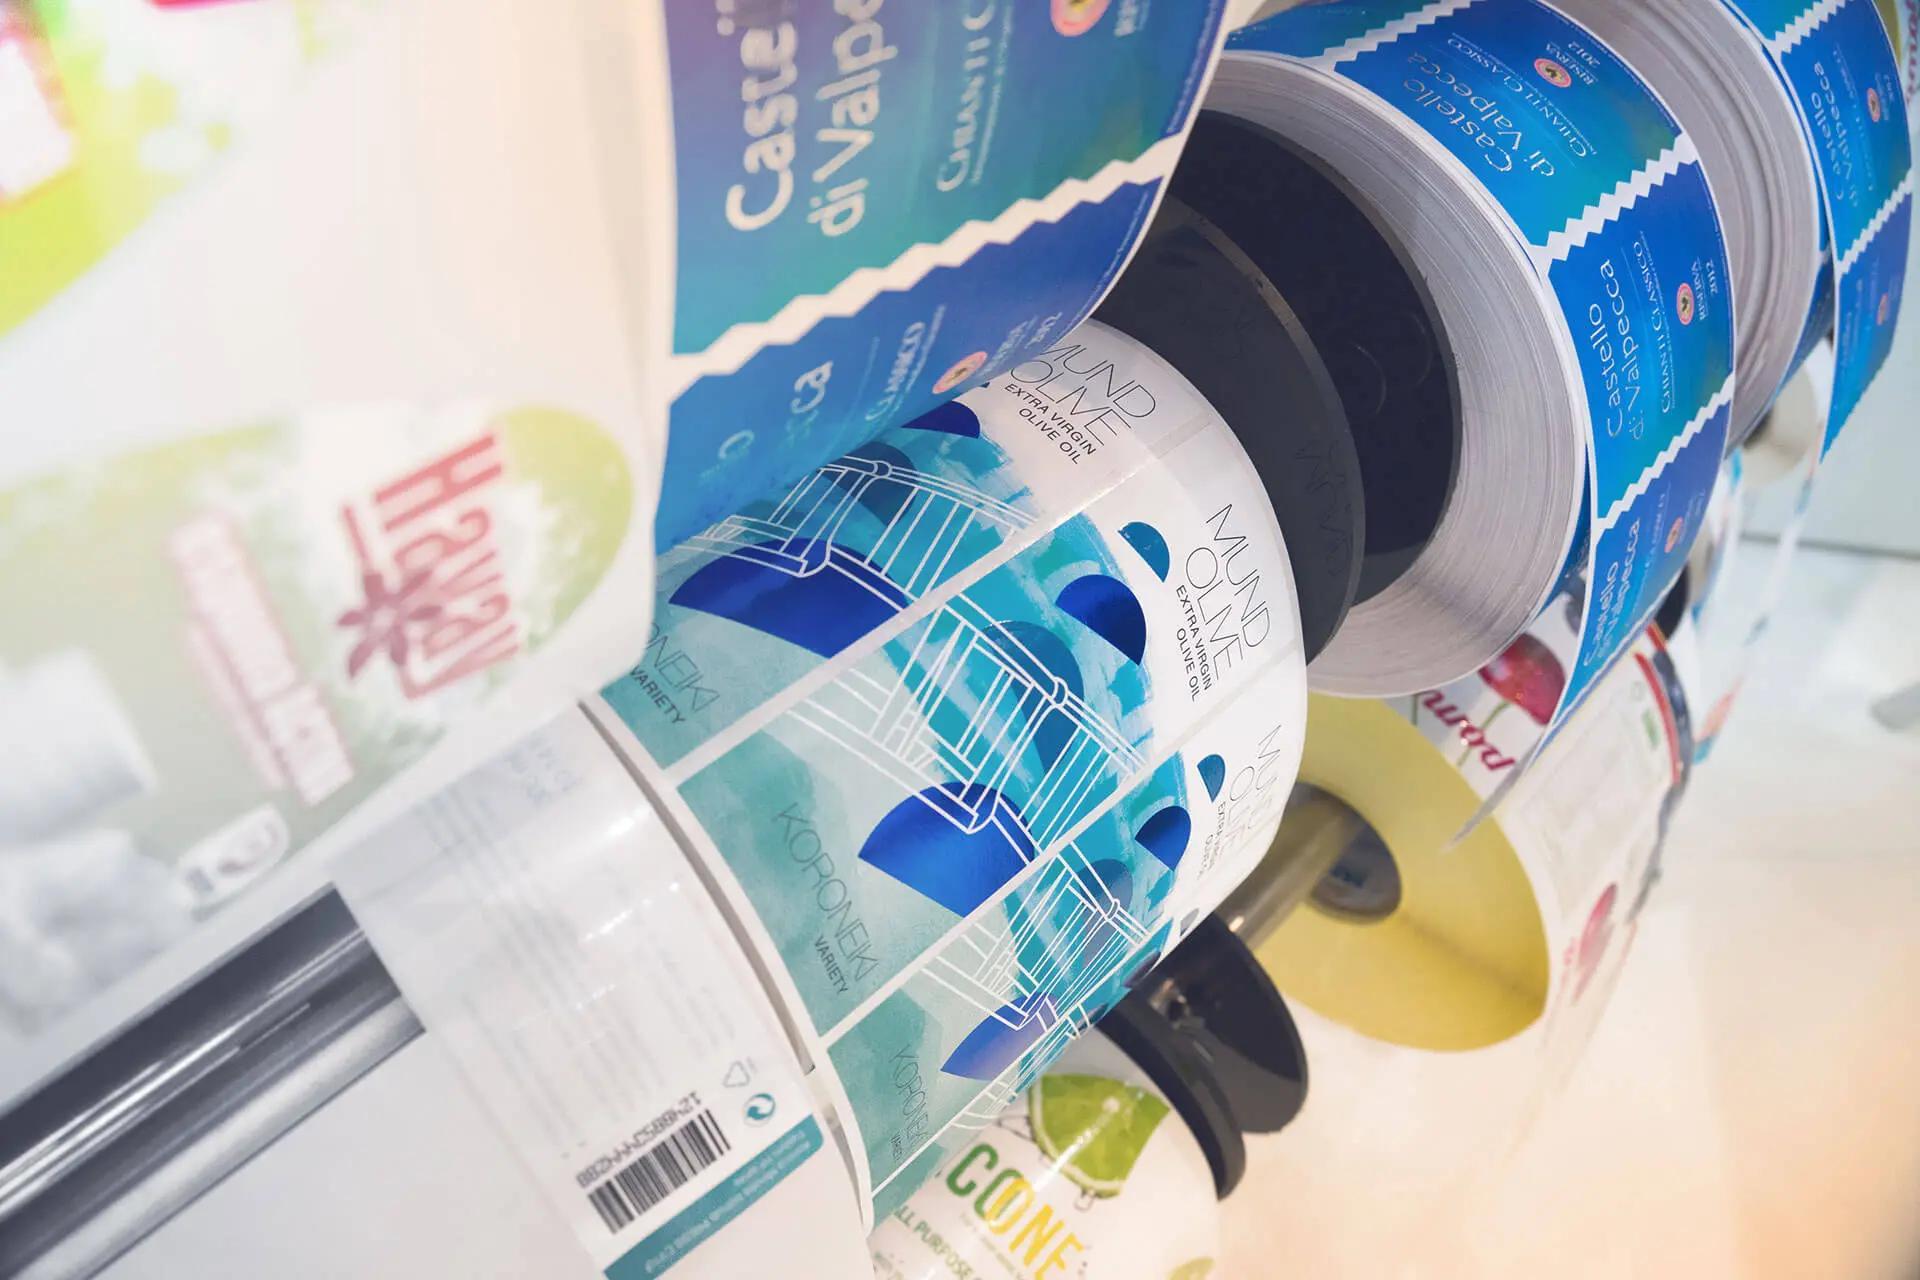 Label printing improves the brands message | KONICA MINOLTA